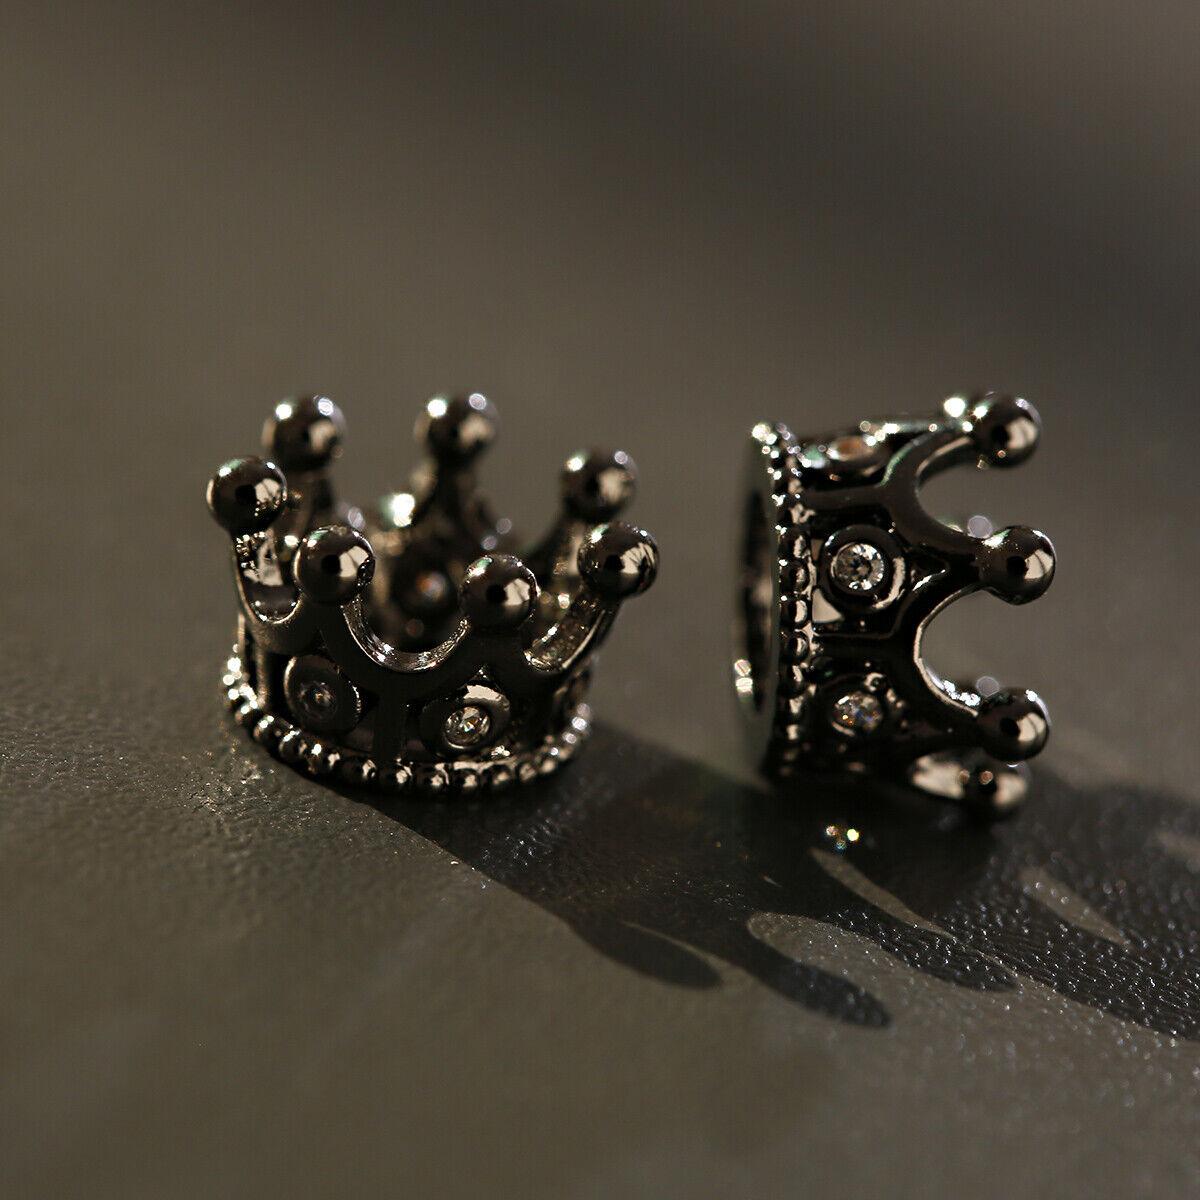 Zircon Gemstones Pave Queen Crown Bracelet Brass Copper Connector Charm Beads 11